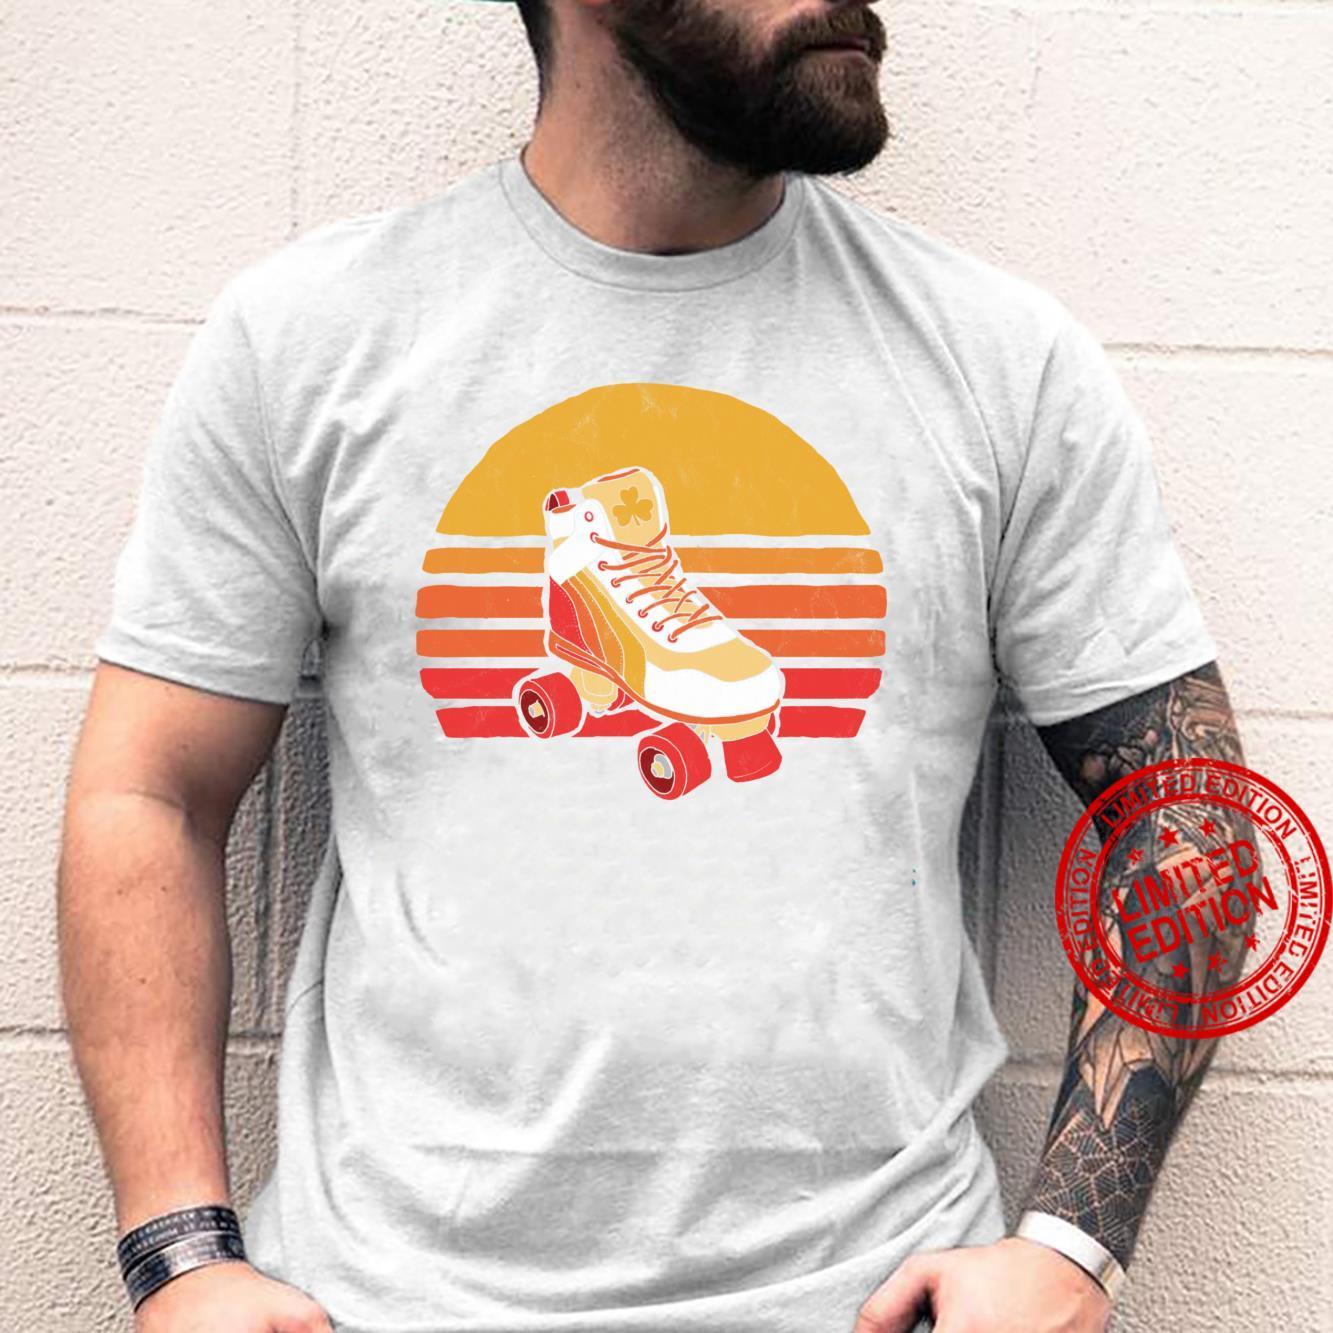 Vintage Distressed Roller Skate Sun Classic Retro Shirt